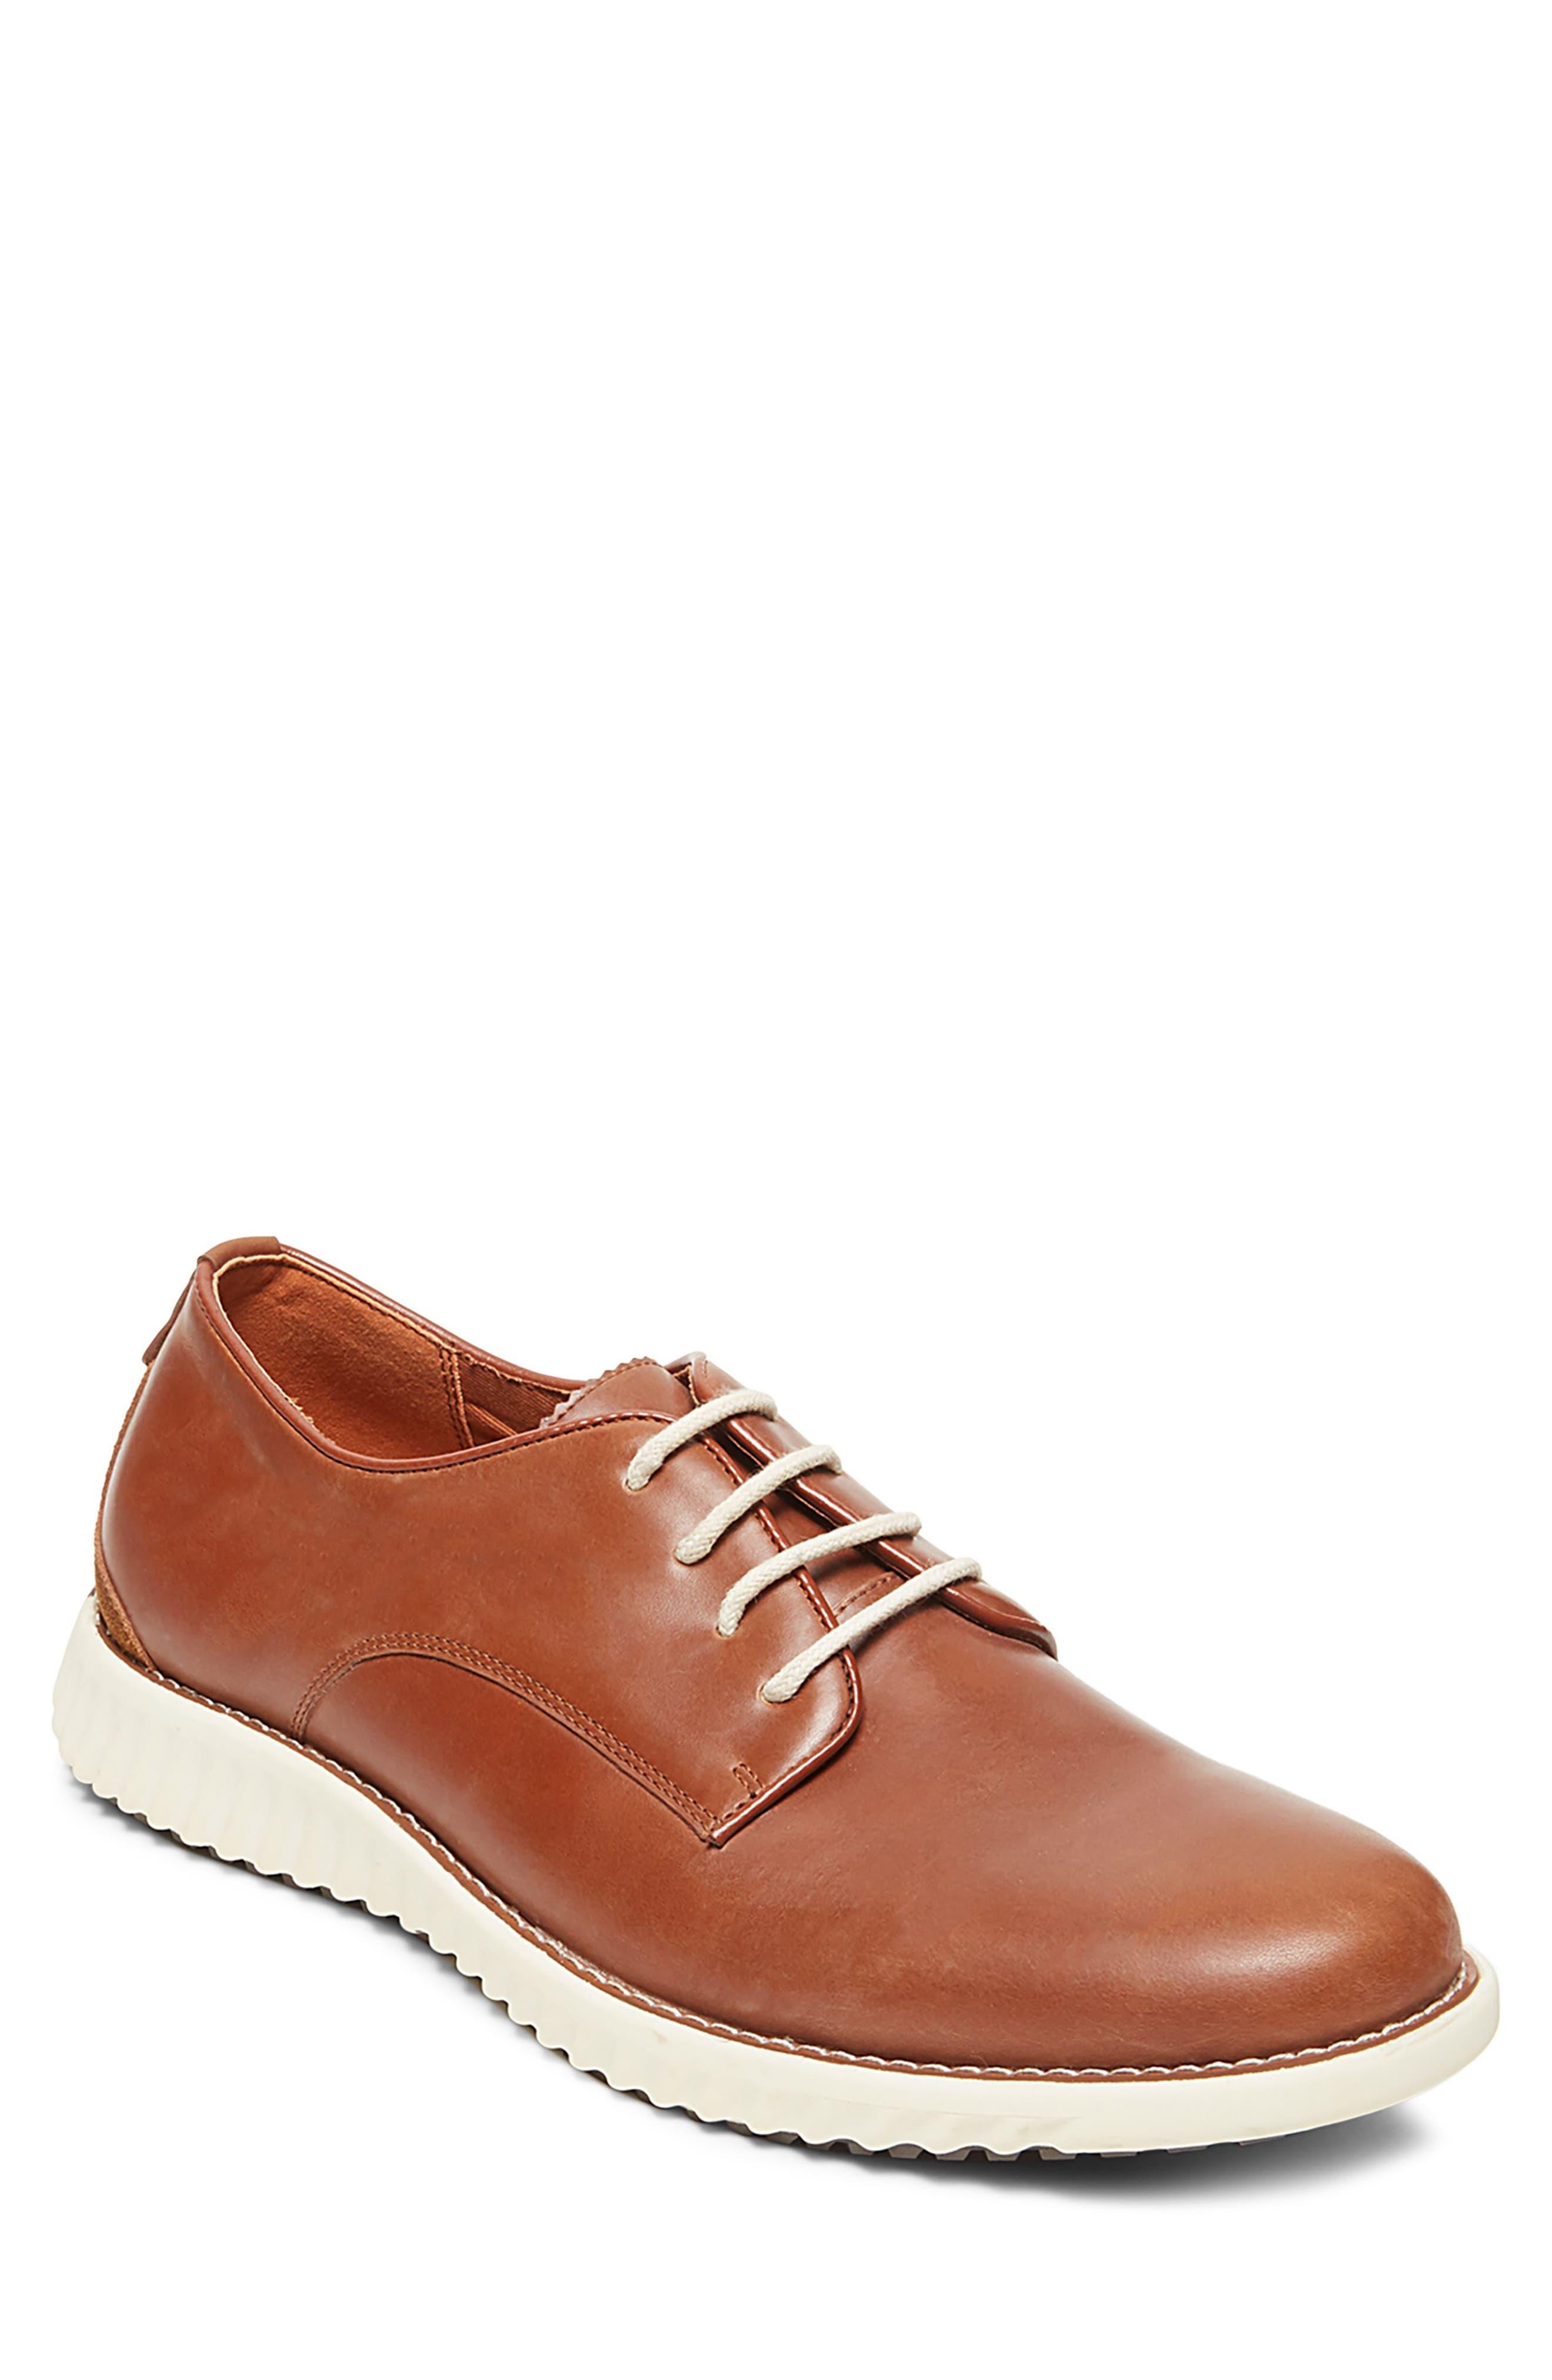 Vance Sneaker,                         Main,                         color, 203